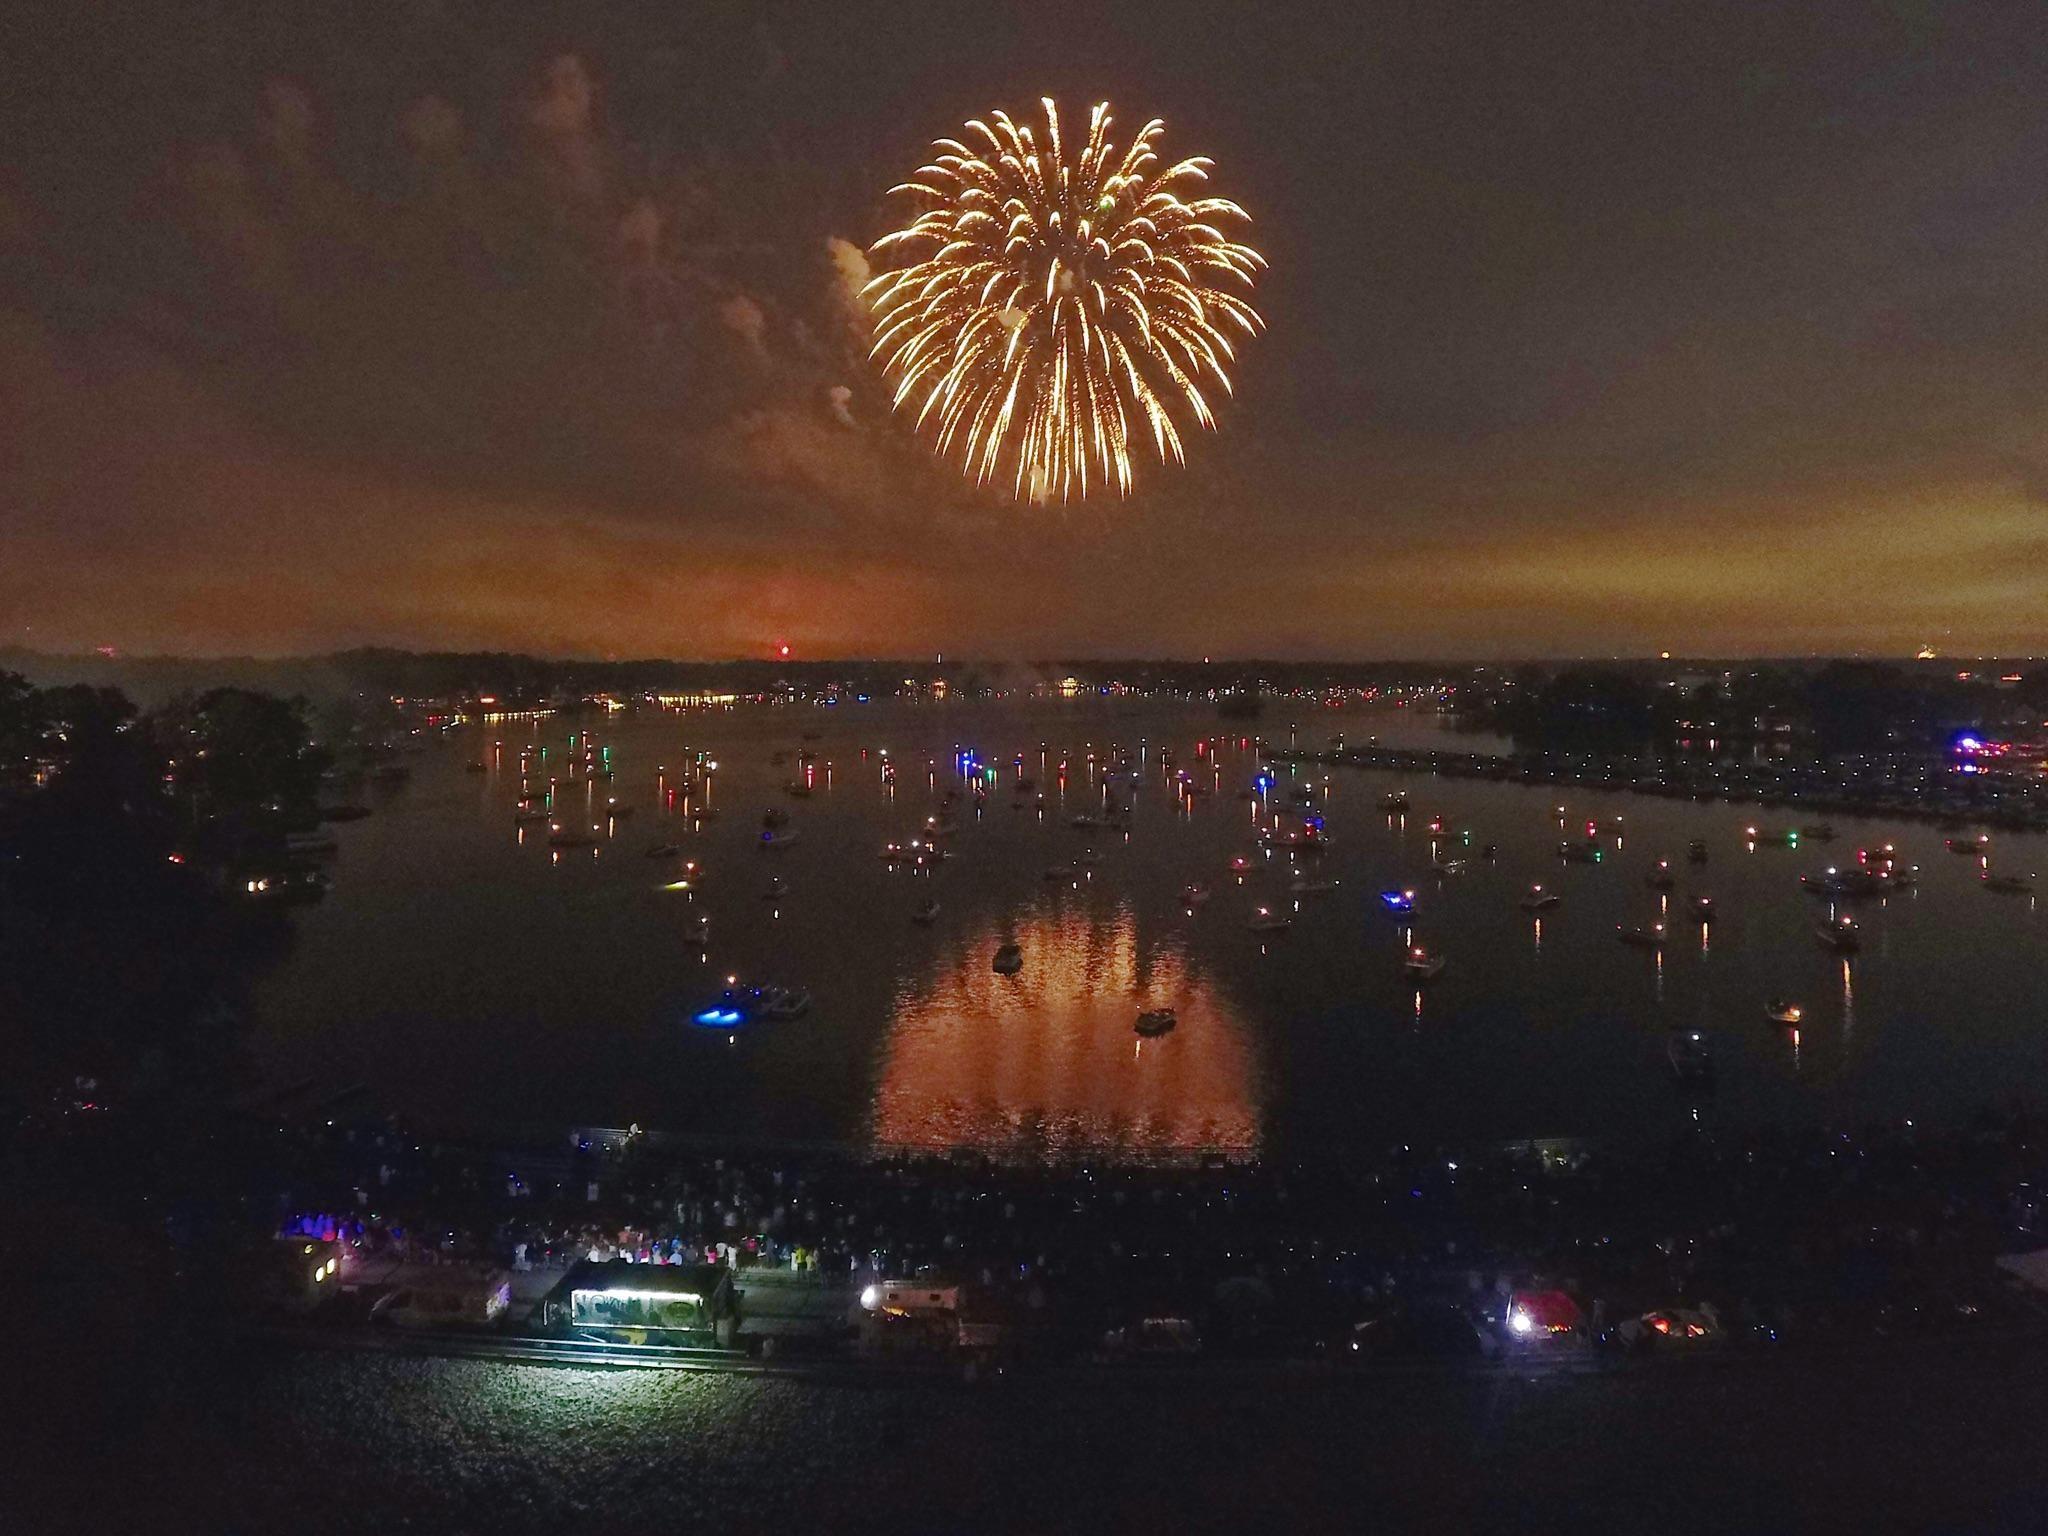 Fireworks over Geist